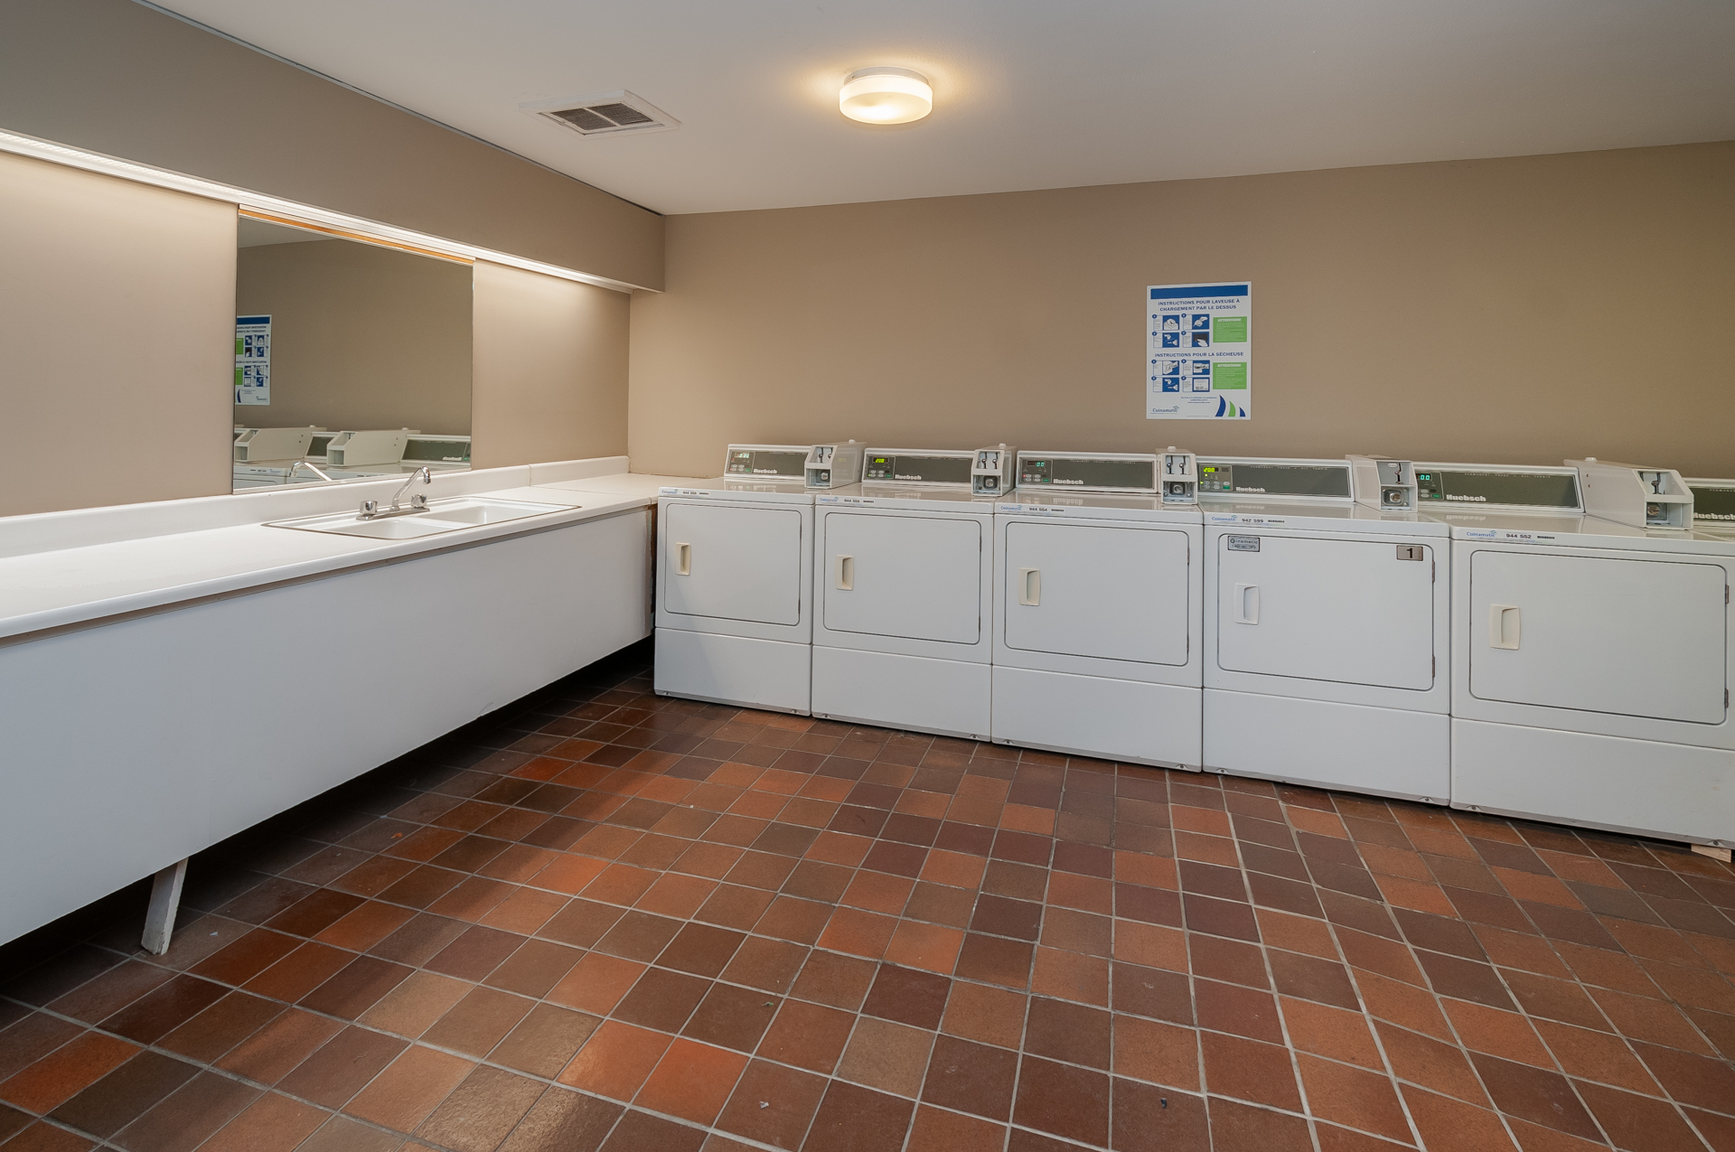 1 bedroom Apartments for rent in Quebec City at Place Samuel de Champlain - Photo 24 - RentersPages – L407129